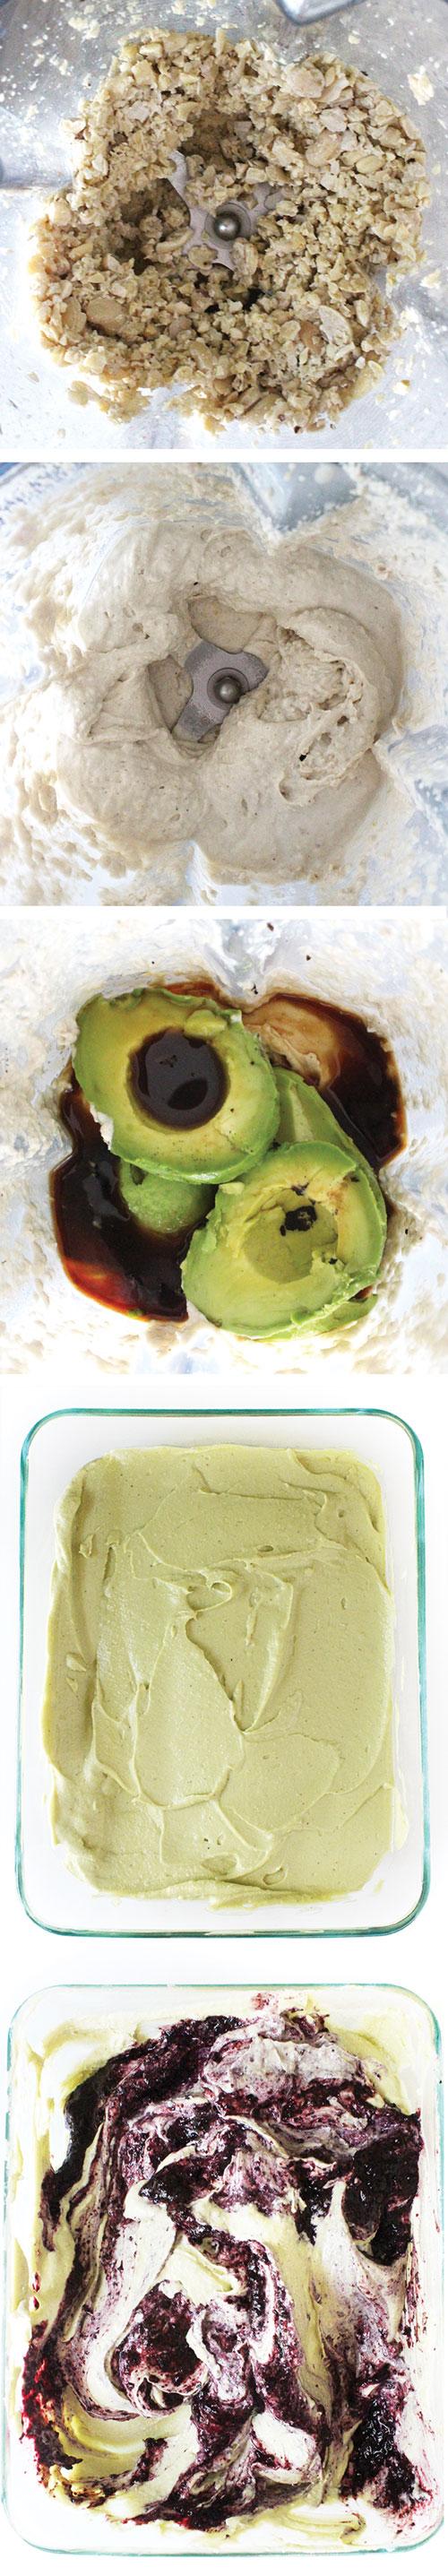 Raw Vegan Ice Cream Instructions